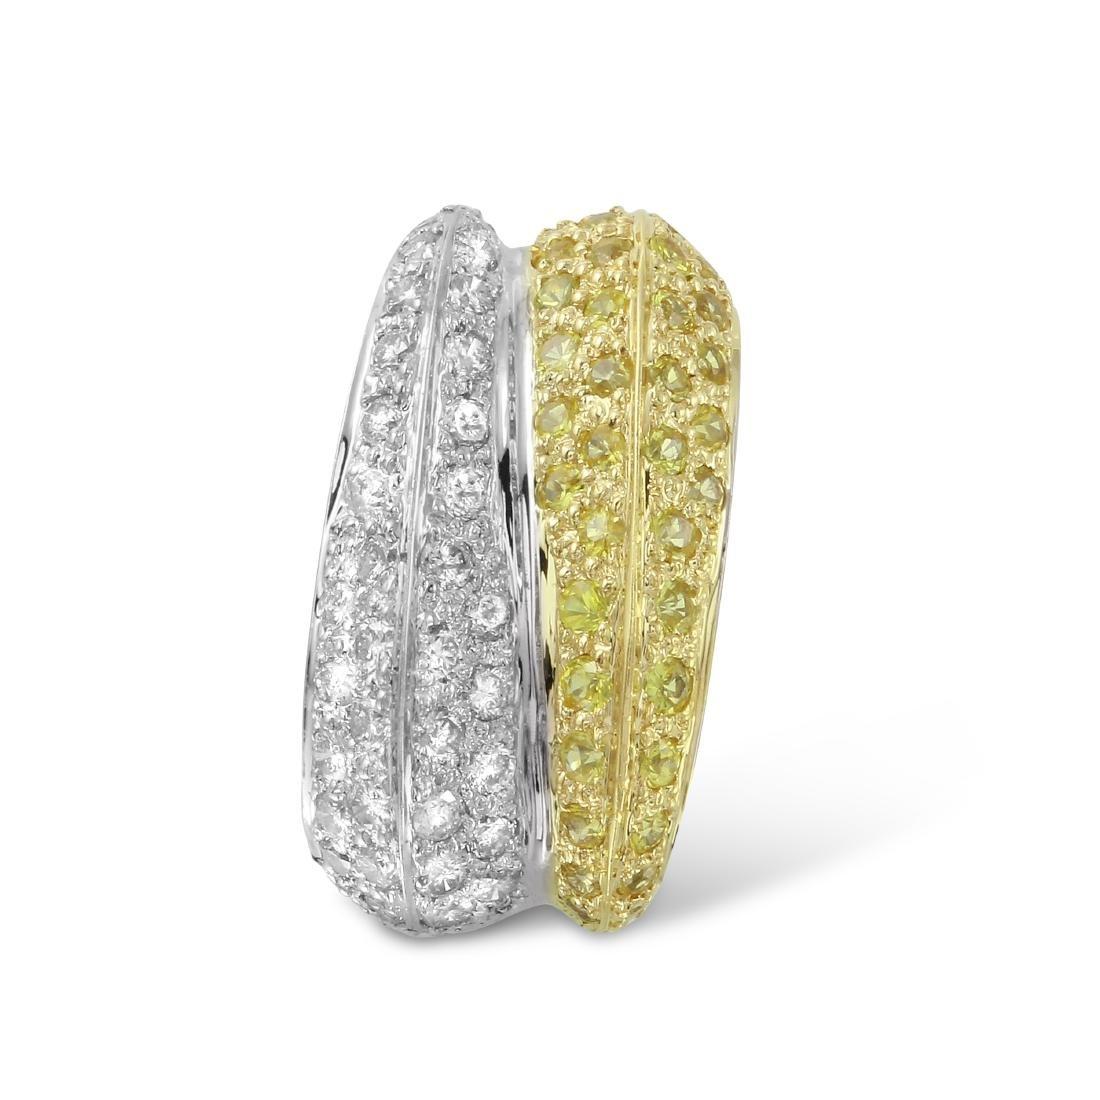 Genuine 0.9 TCW 14K Two Tone Gold Ladies Pendant